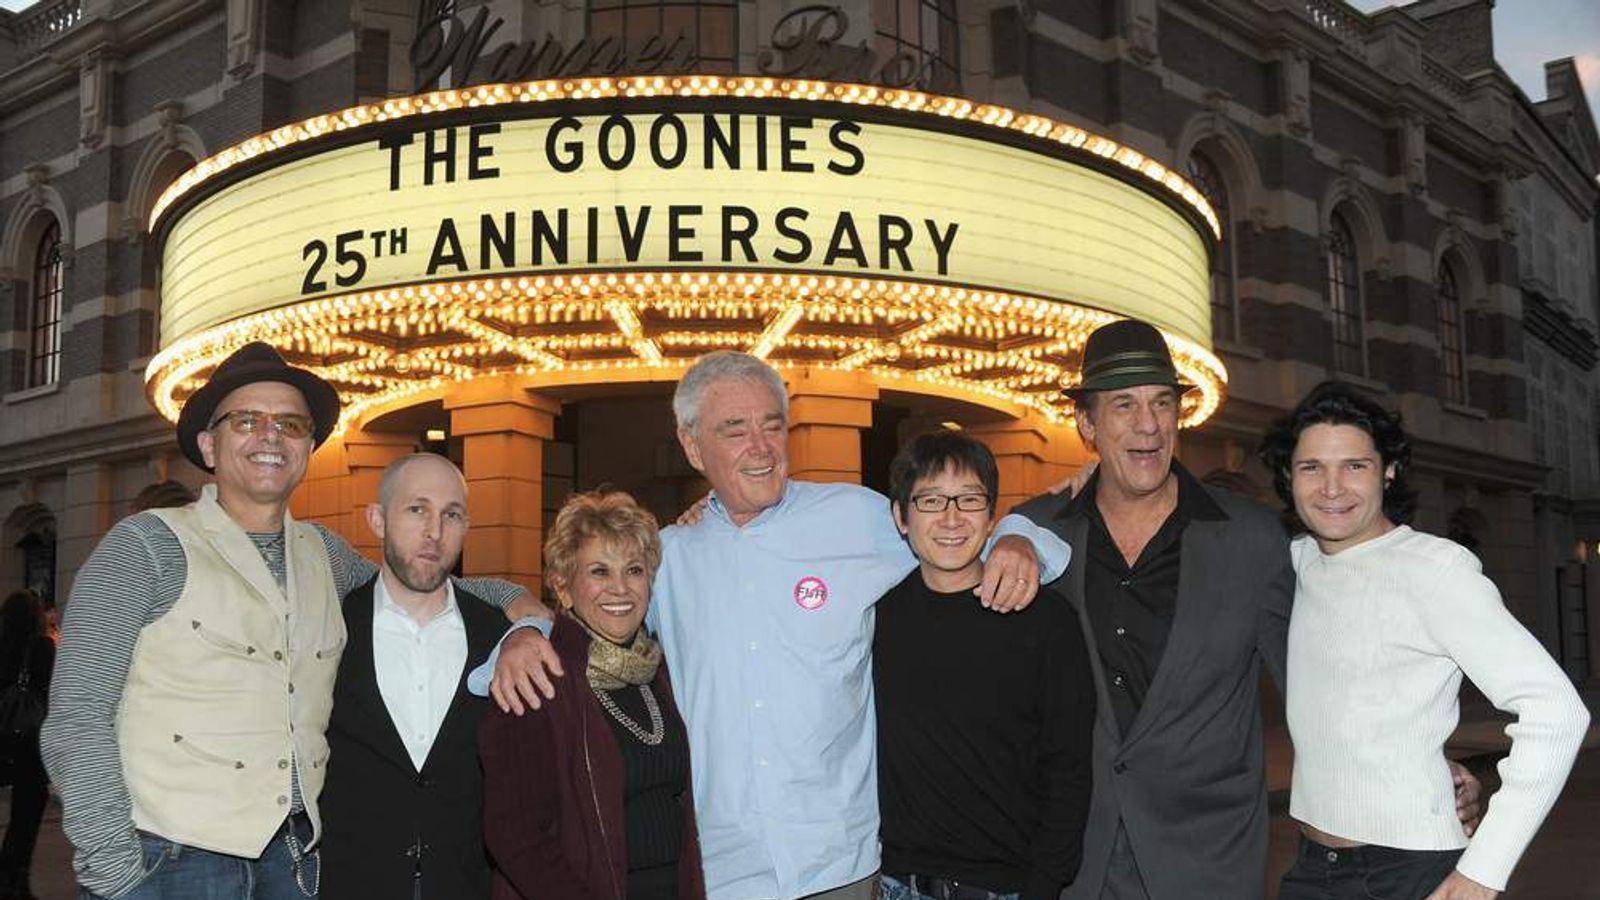 The goonies cast 2012